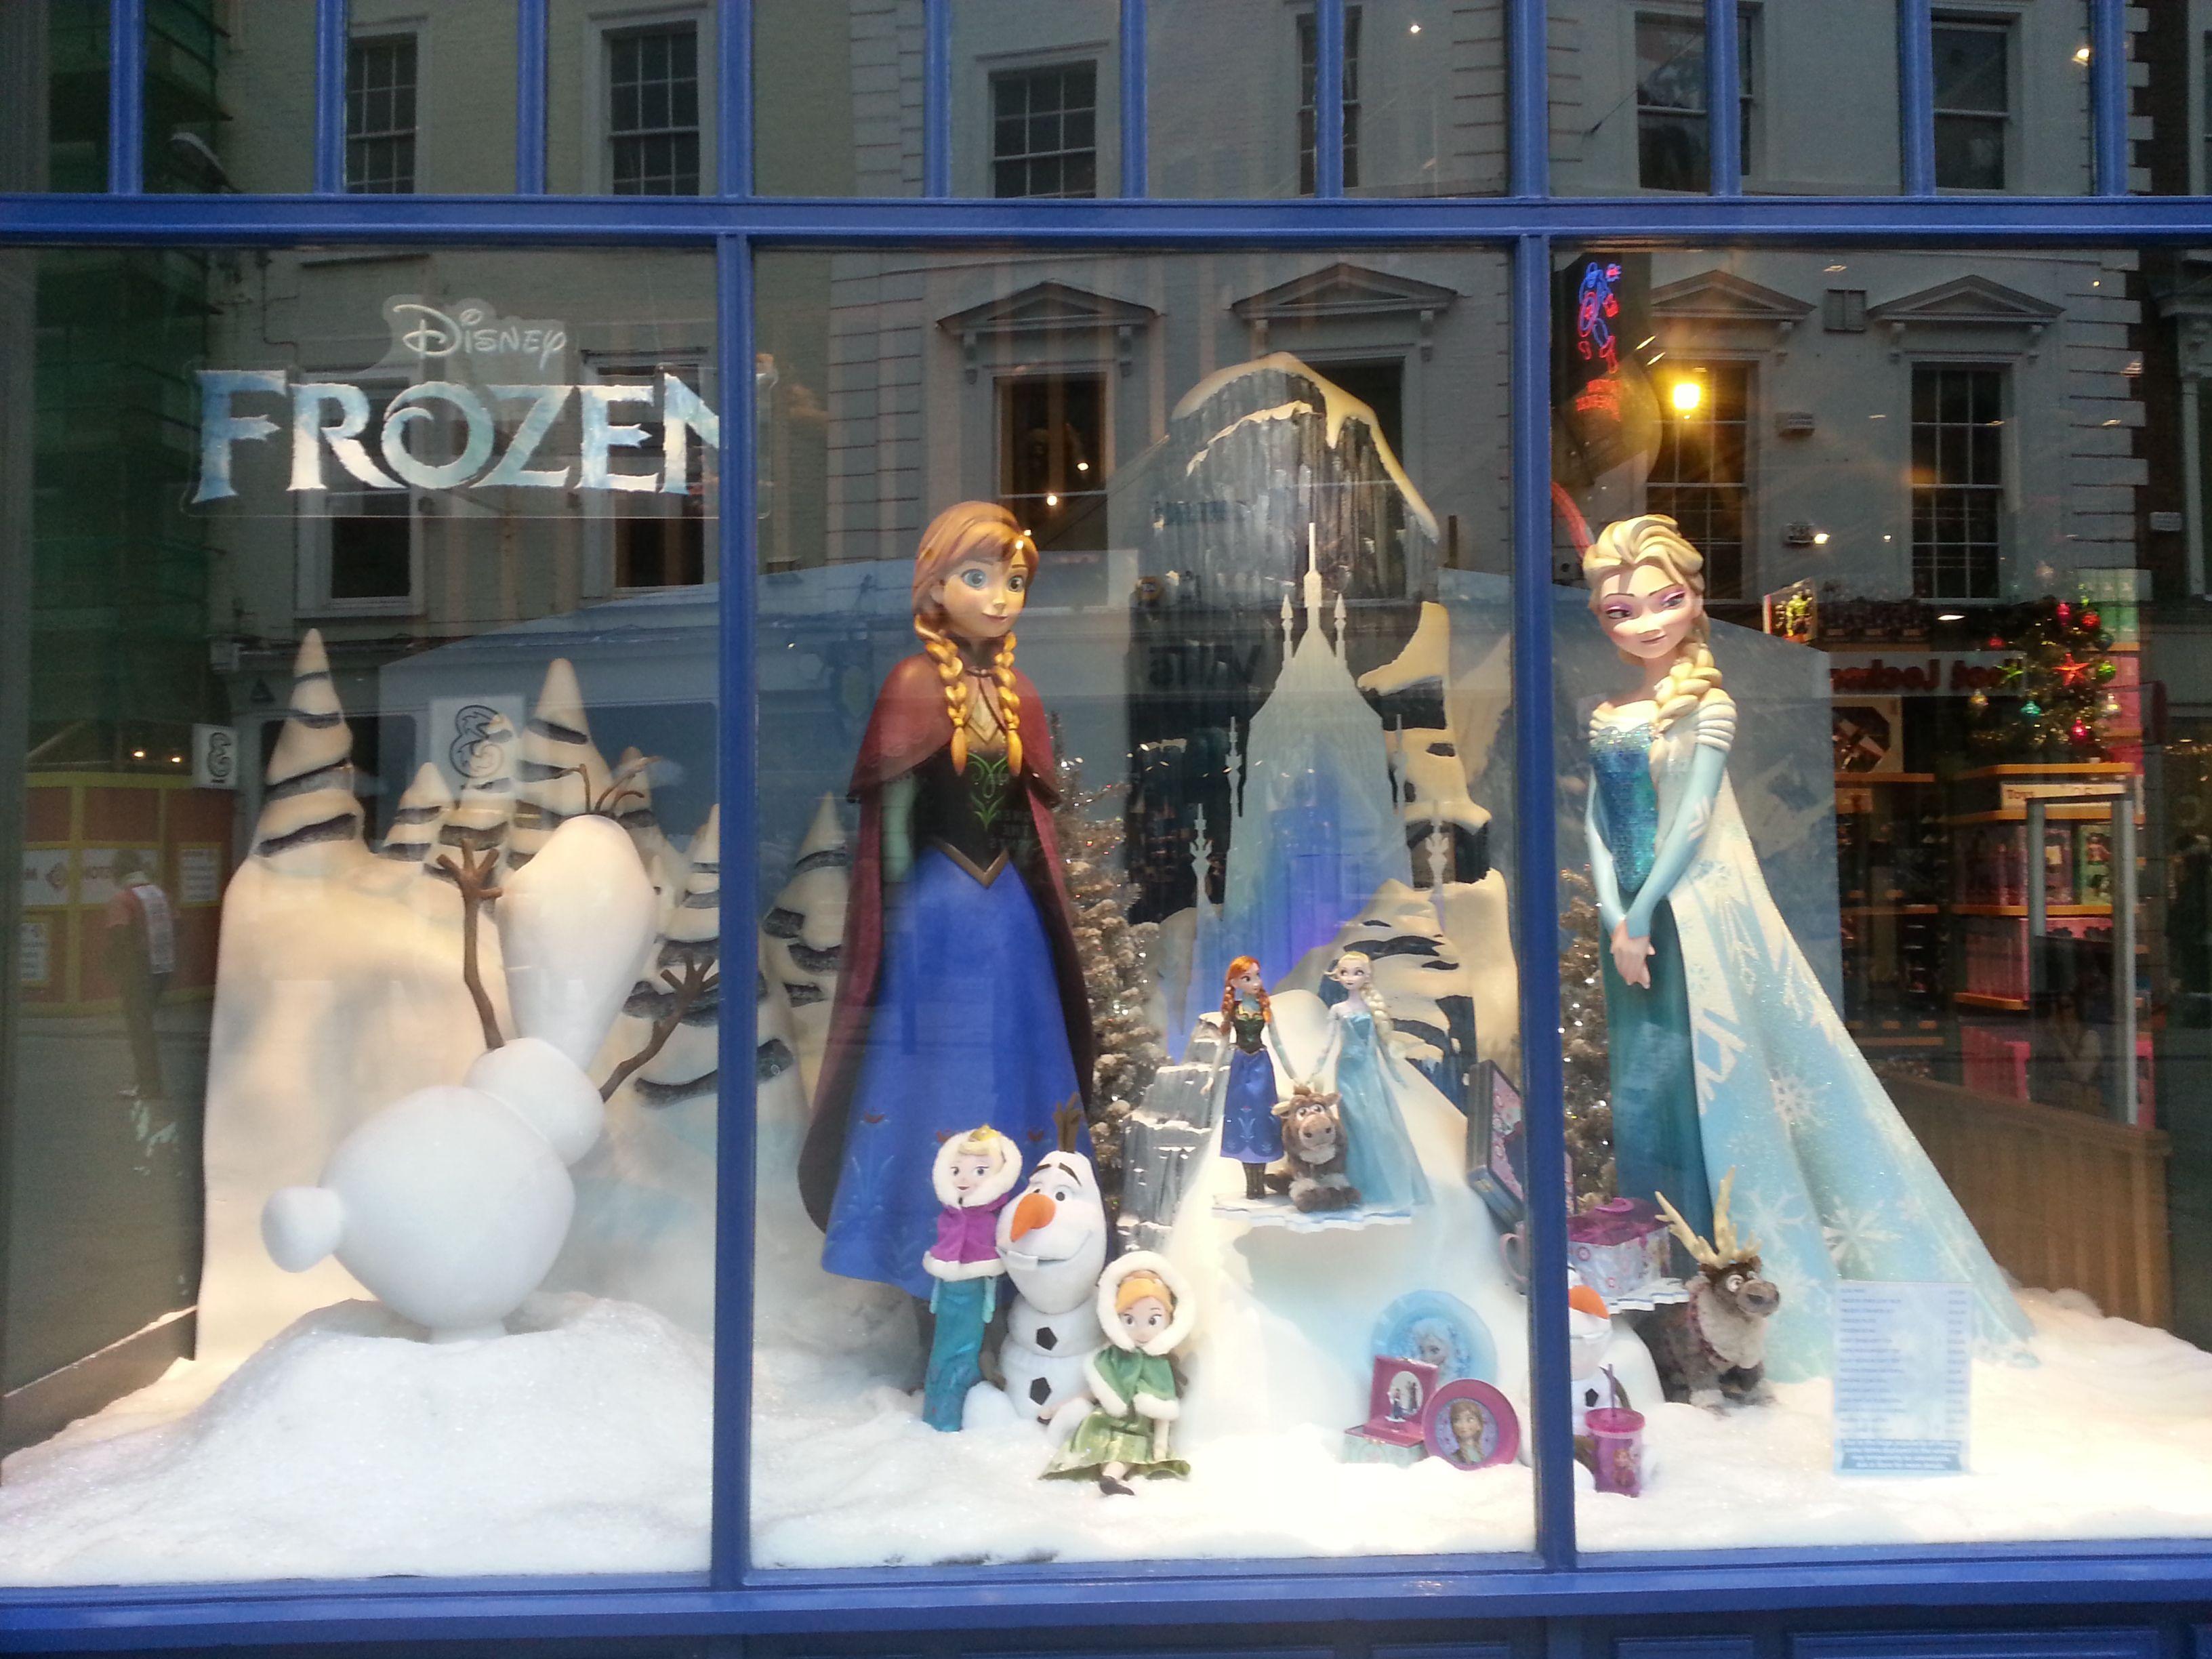 The Frozen Display In The Disney Shop On Grafton Street